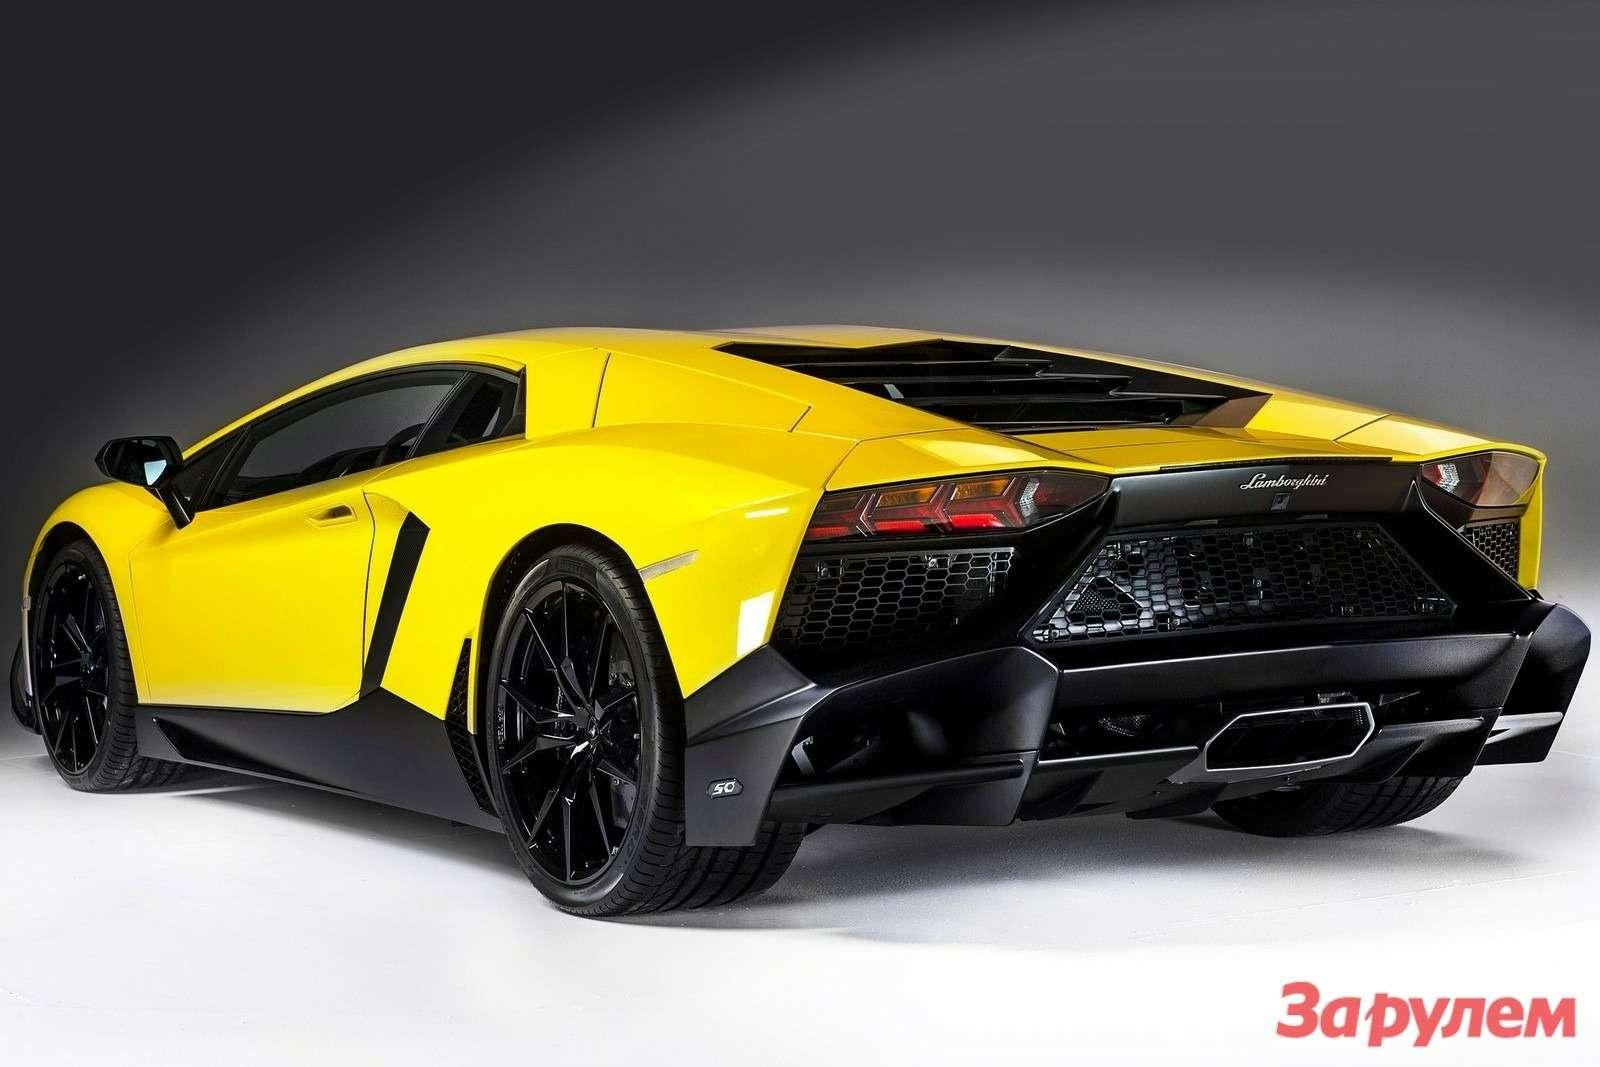 Lamborghini Aventador LP7204 50th Anniversary 2013 1600x1200 wallpaper 03